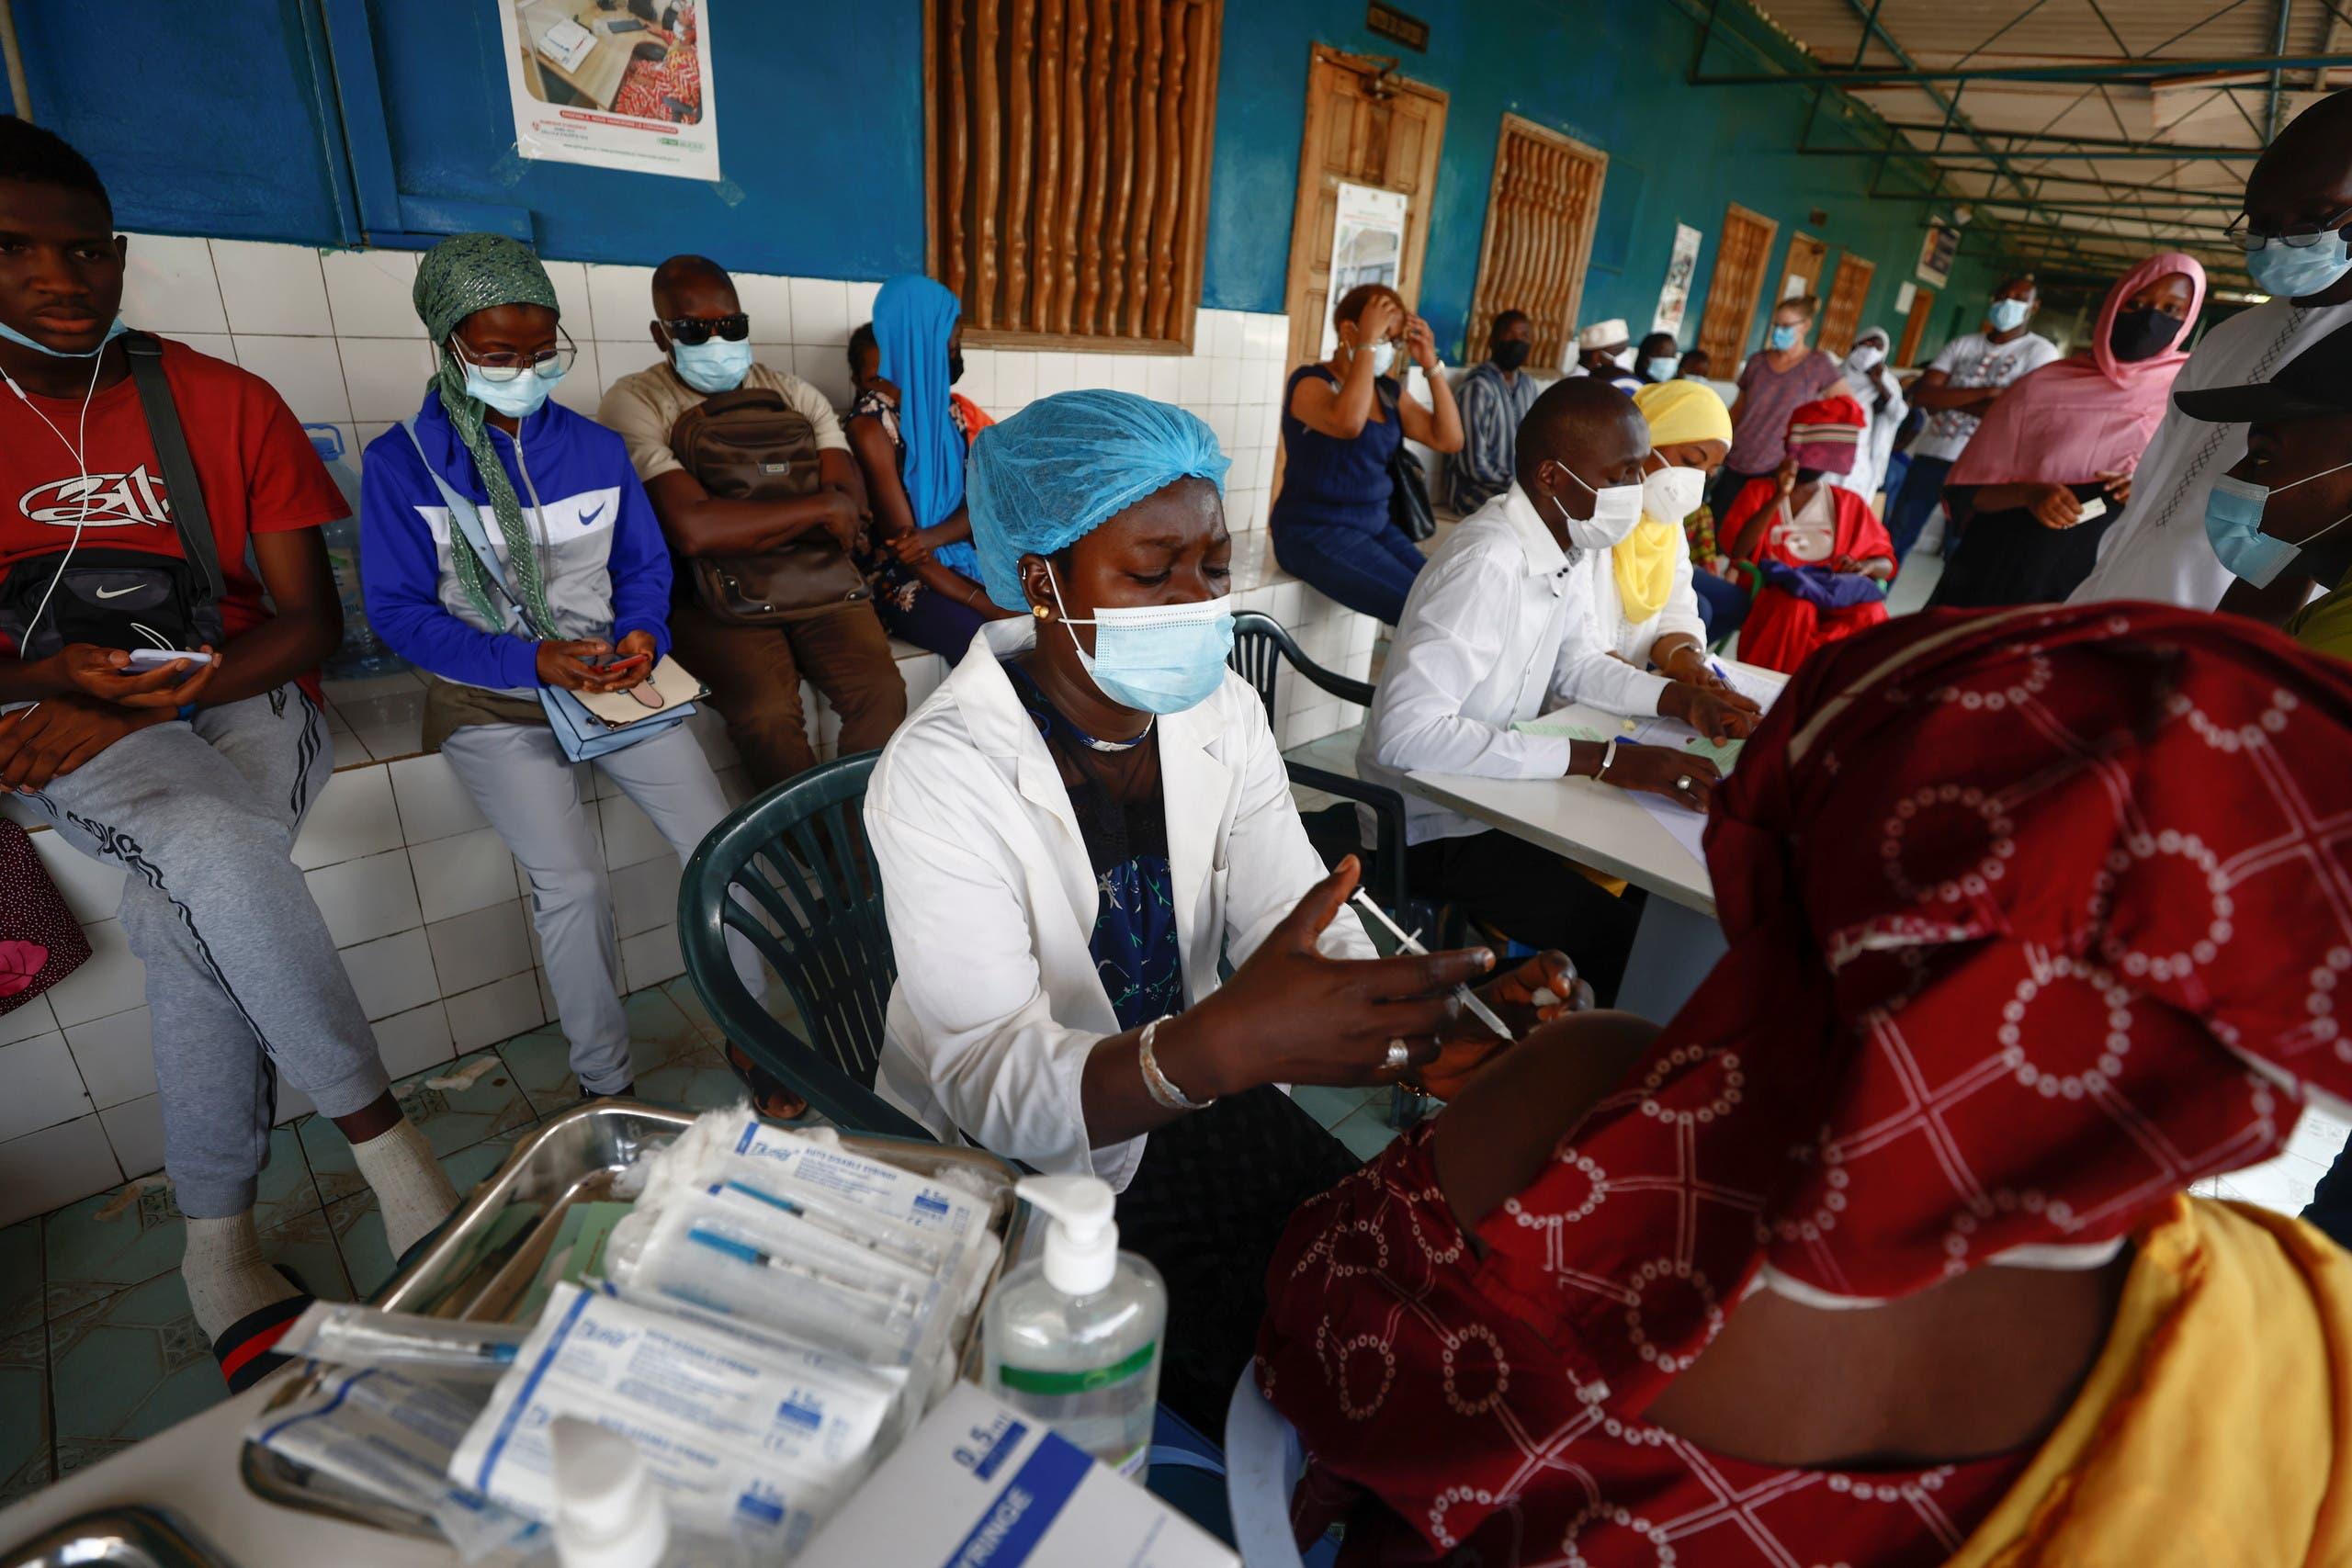 Aminata Laye Diagne, a nurse gives a dose of coronavirus disease (COVID-19) vaccine to a woman at Philippe Senghor Hospital in Dakar, amid a surge of coronavirus disease (COVID-19) cases in Senegal July 28, 2021. Picture taken July 28, 2021. (Reuters)